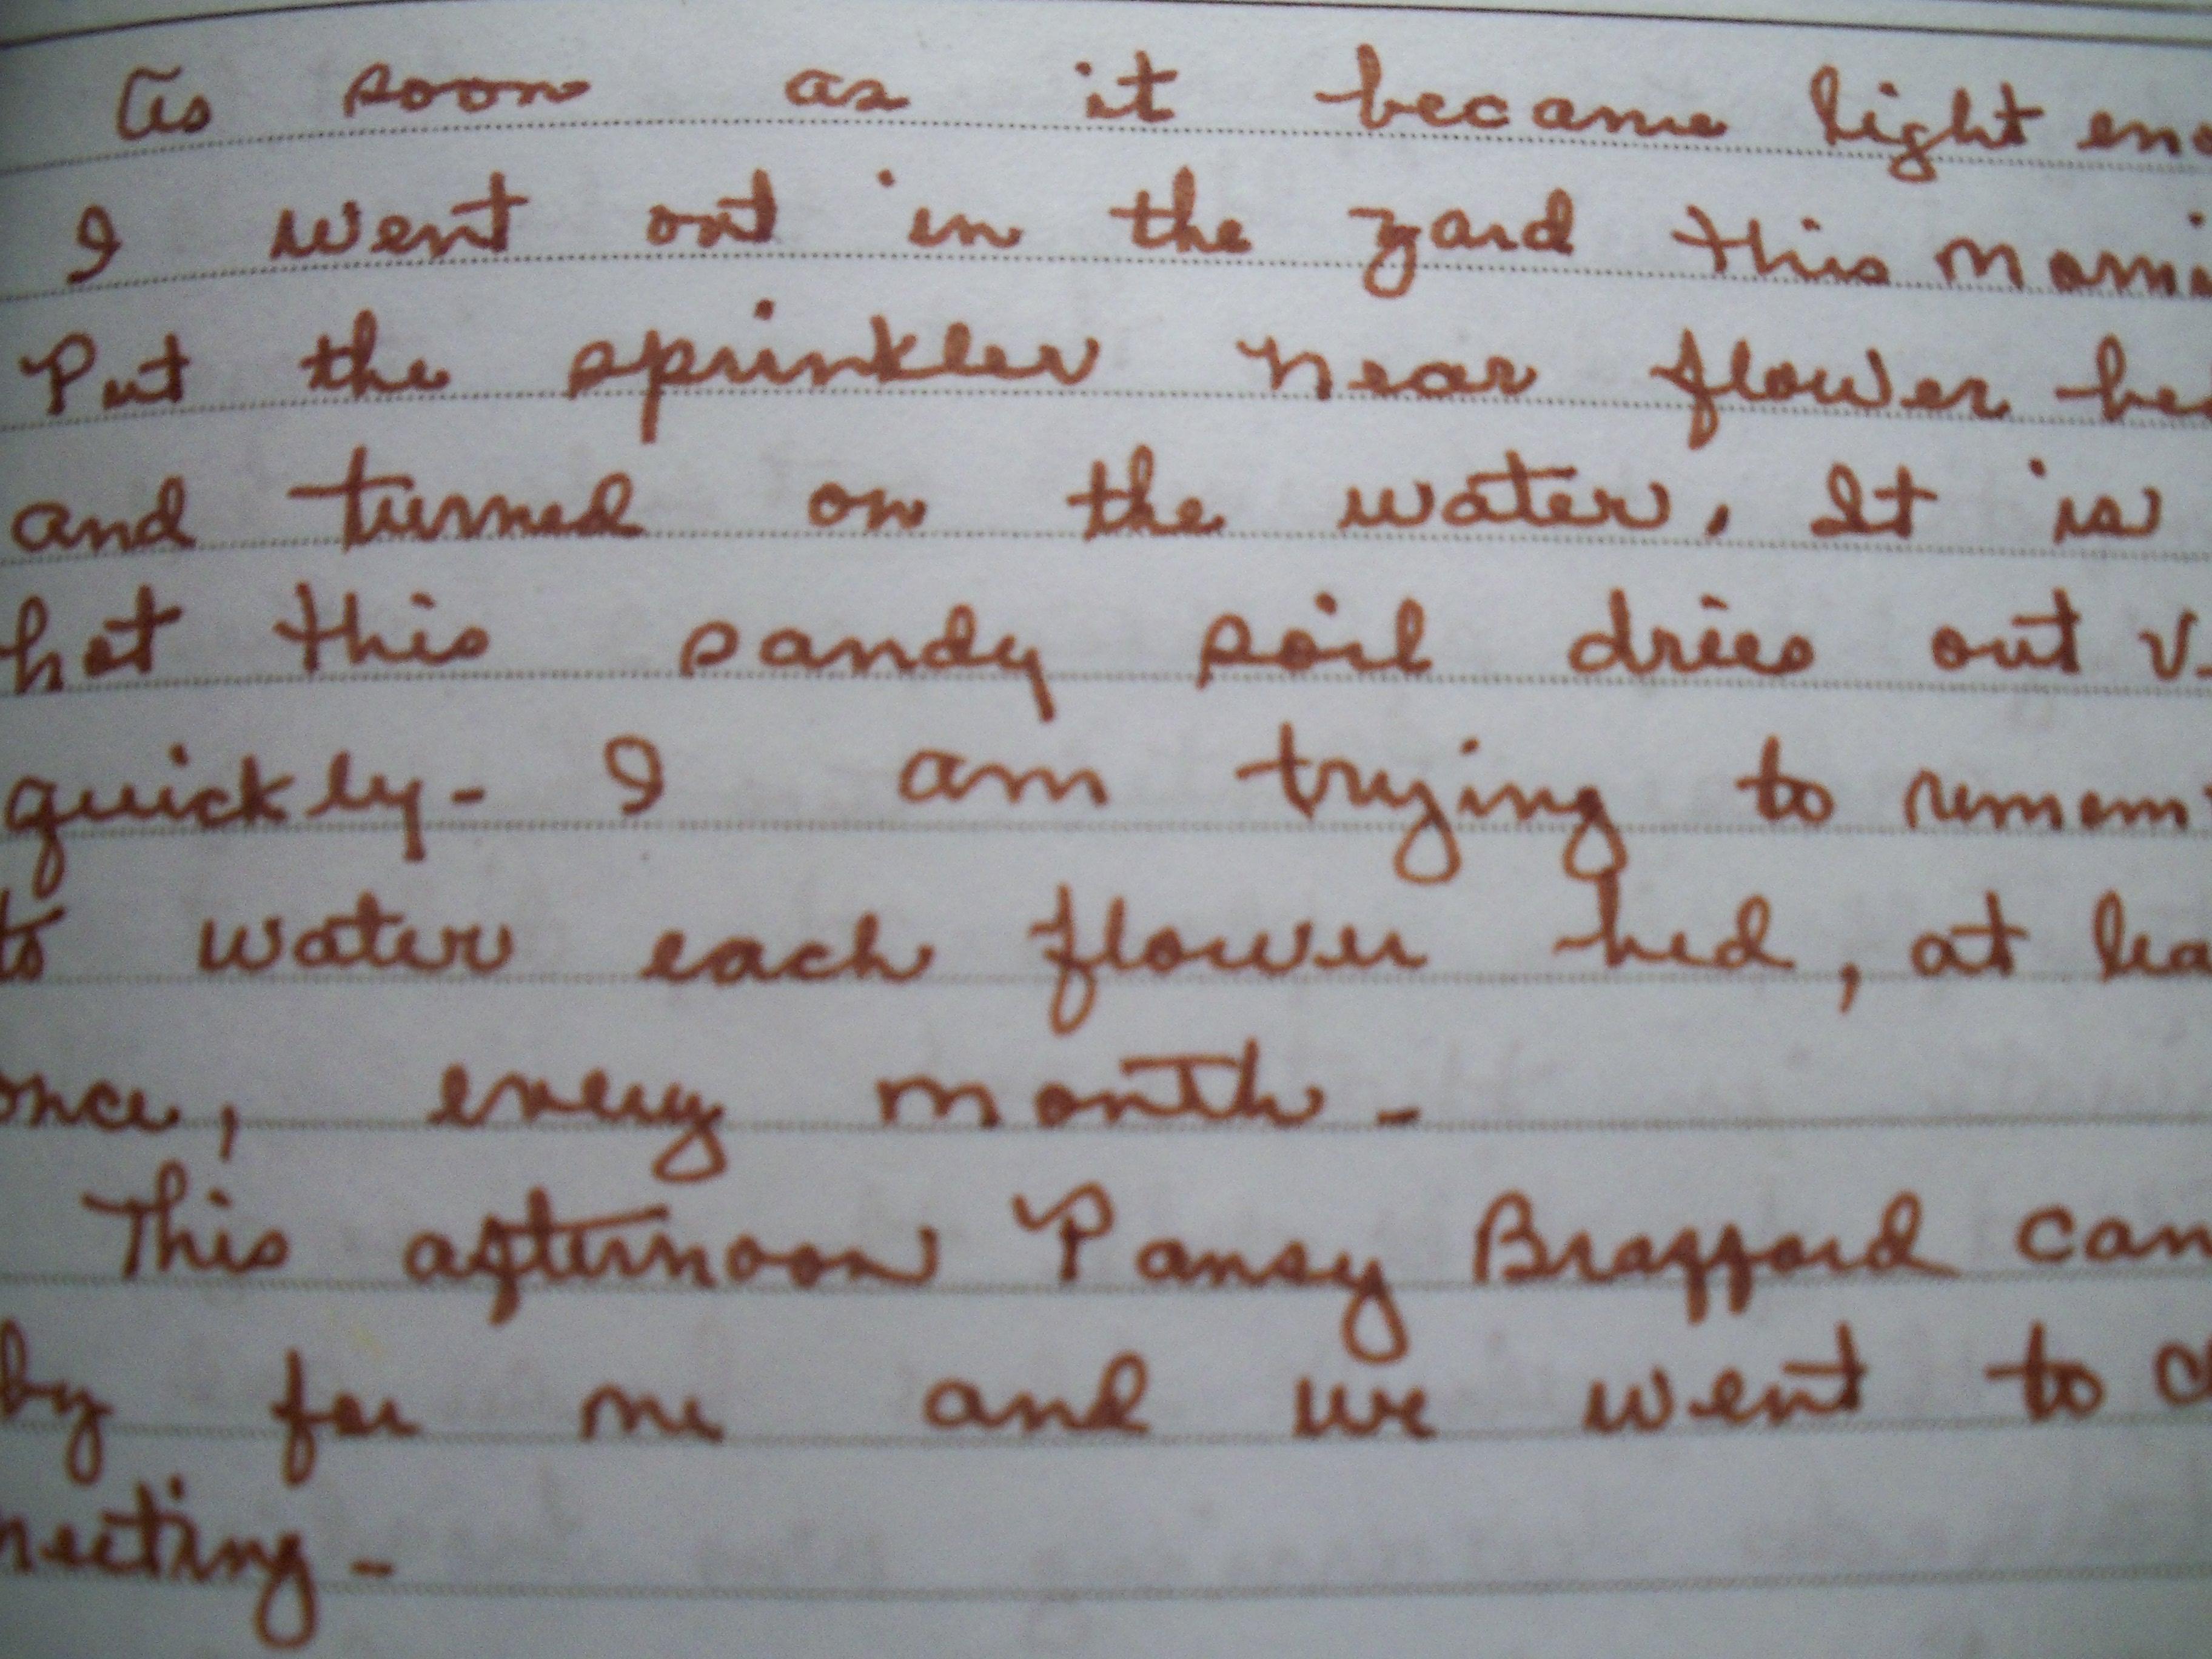 Impressive essay (I think) but poor handwriting....?